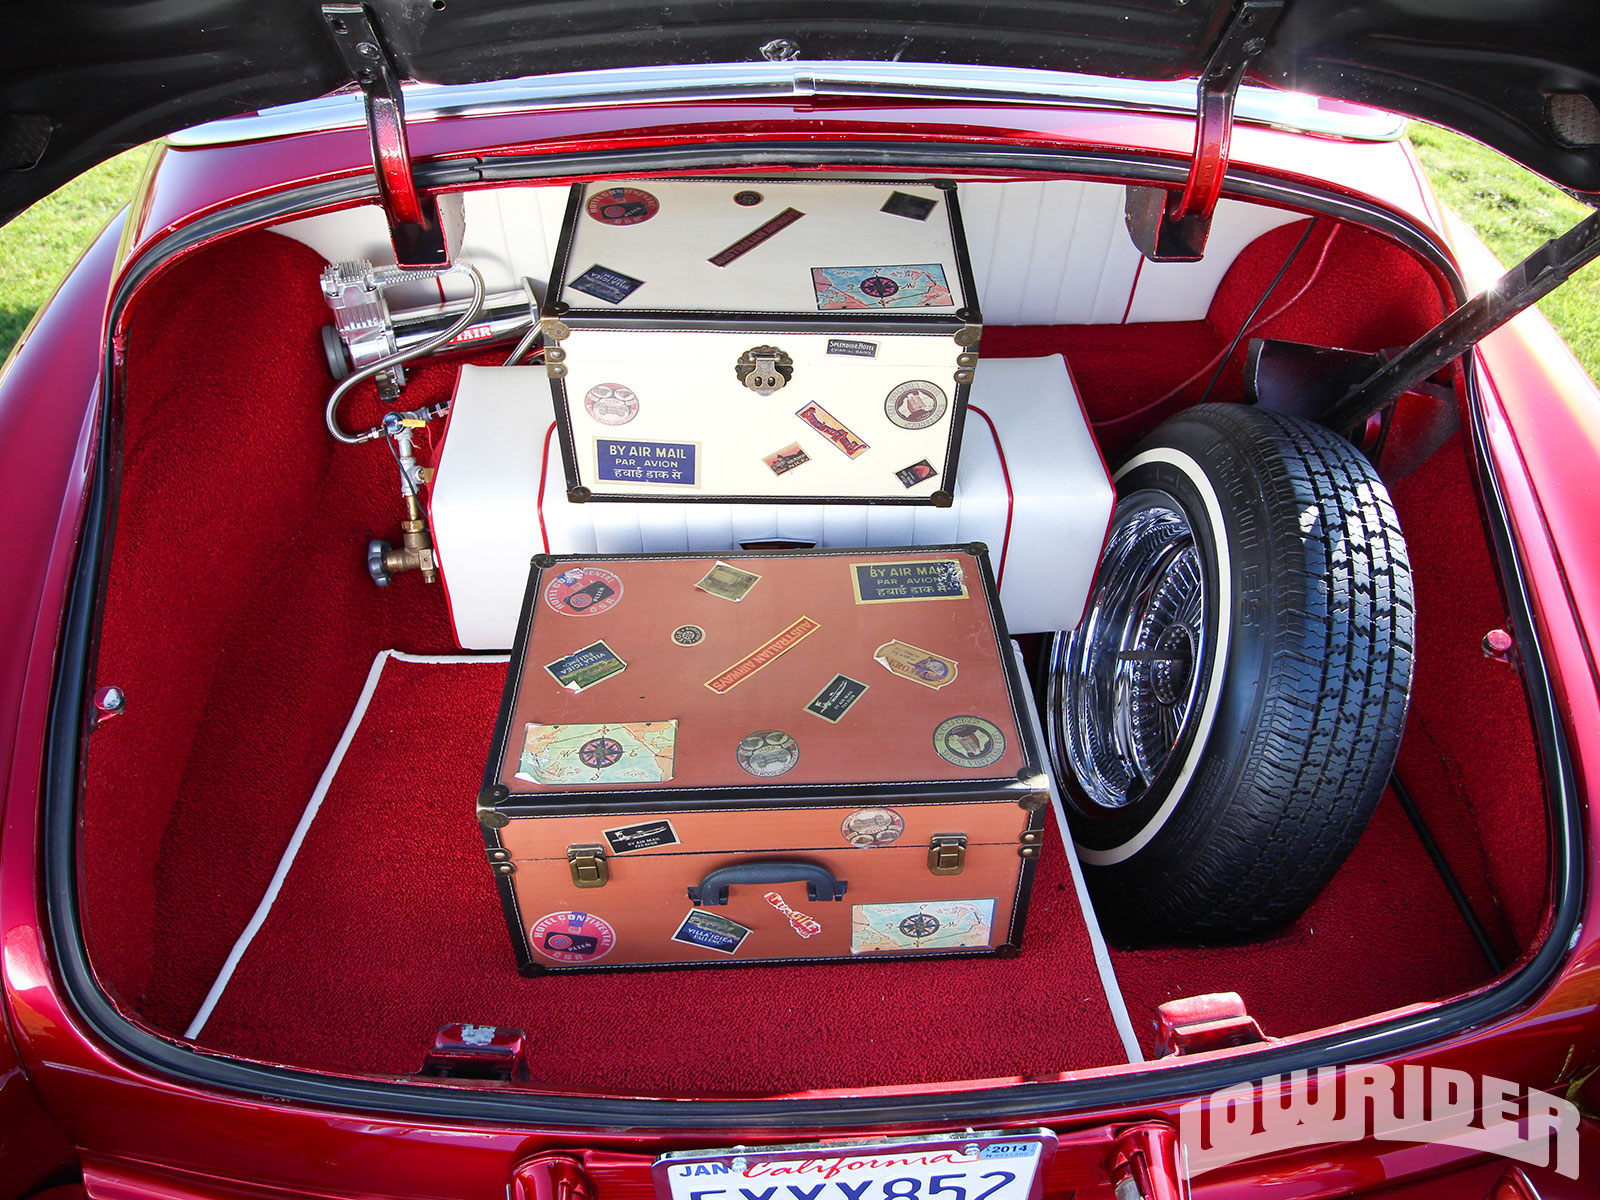 1946 Cadillac Club Coupe 62 Series and 1947 Cadillac Sedan ...